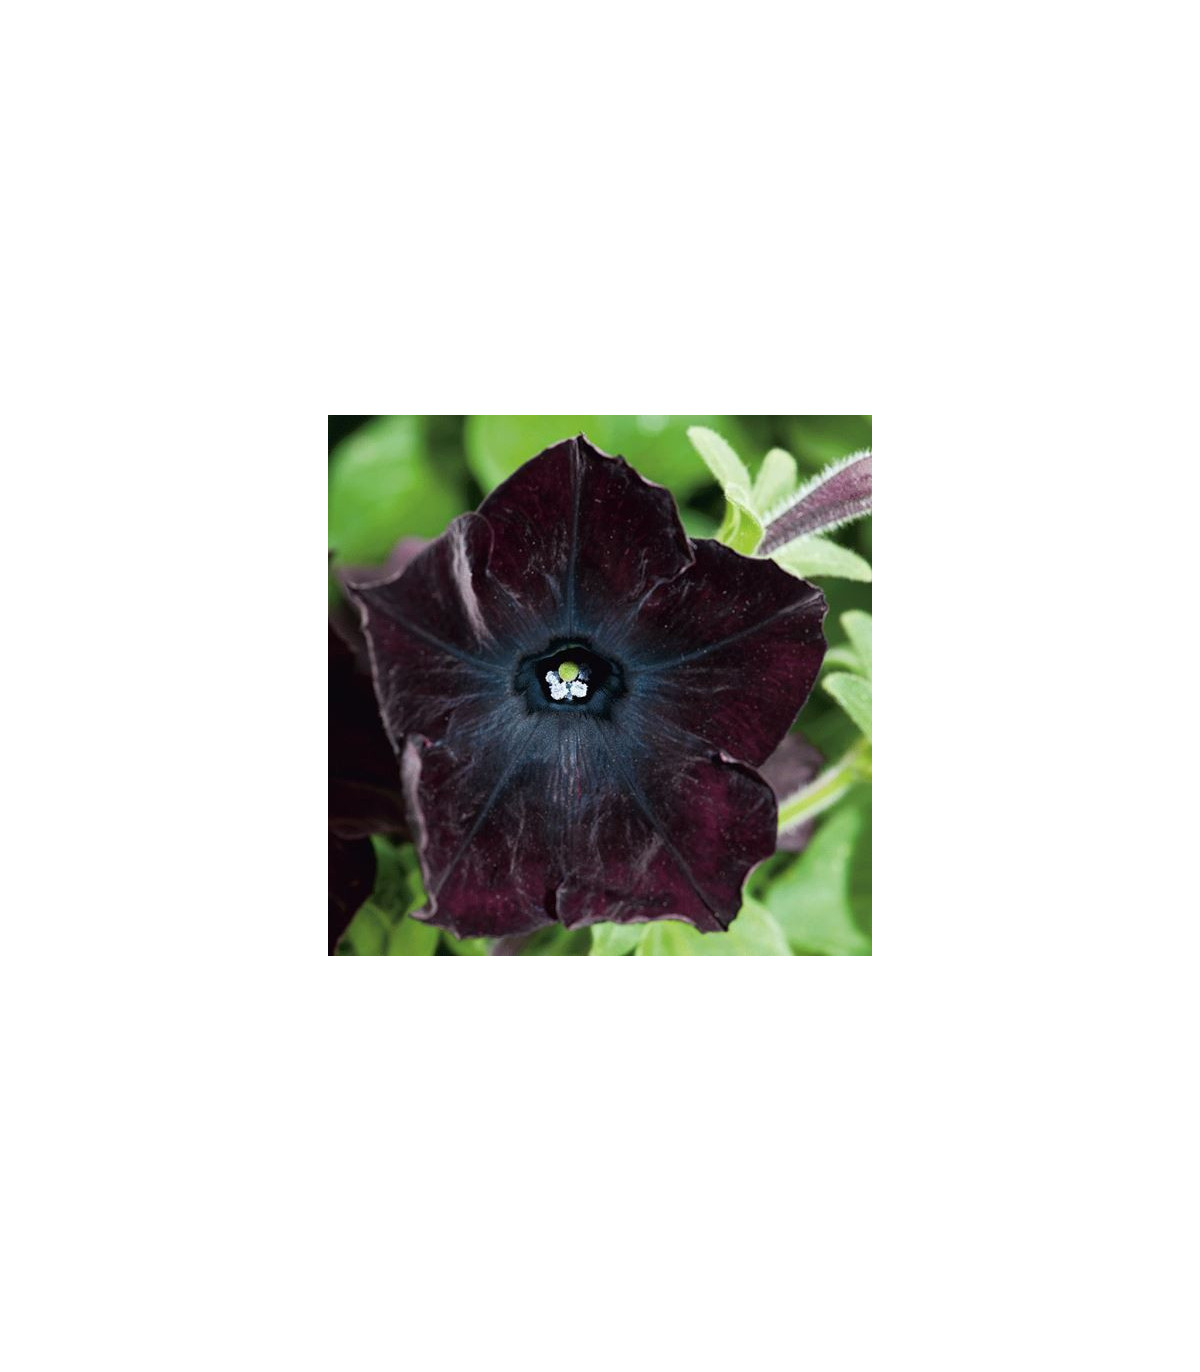 Petúnia Sophistica Blackberry - Petunia nana compacta - Semená - 15 ks